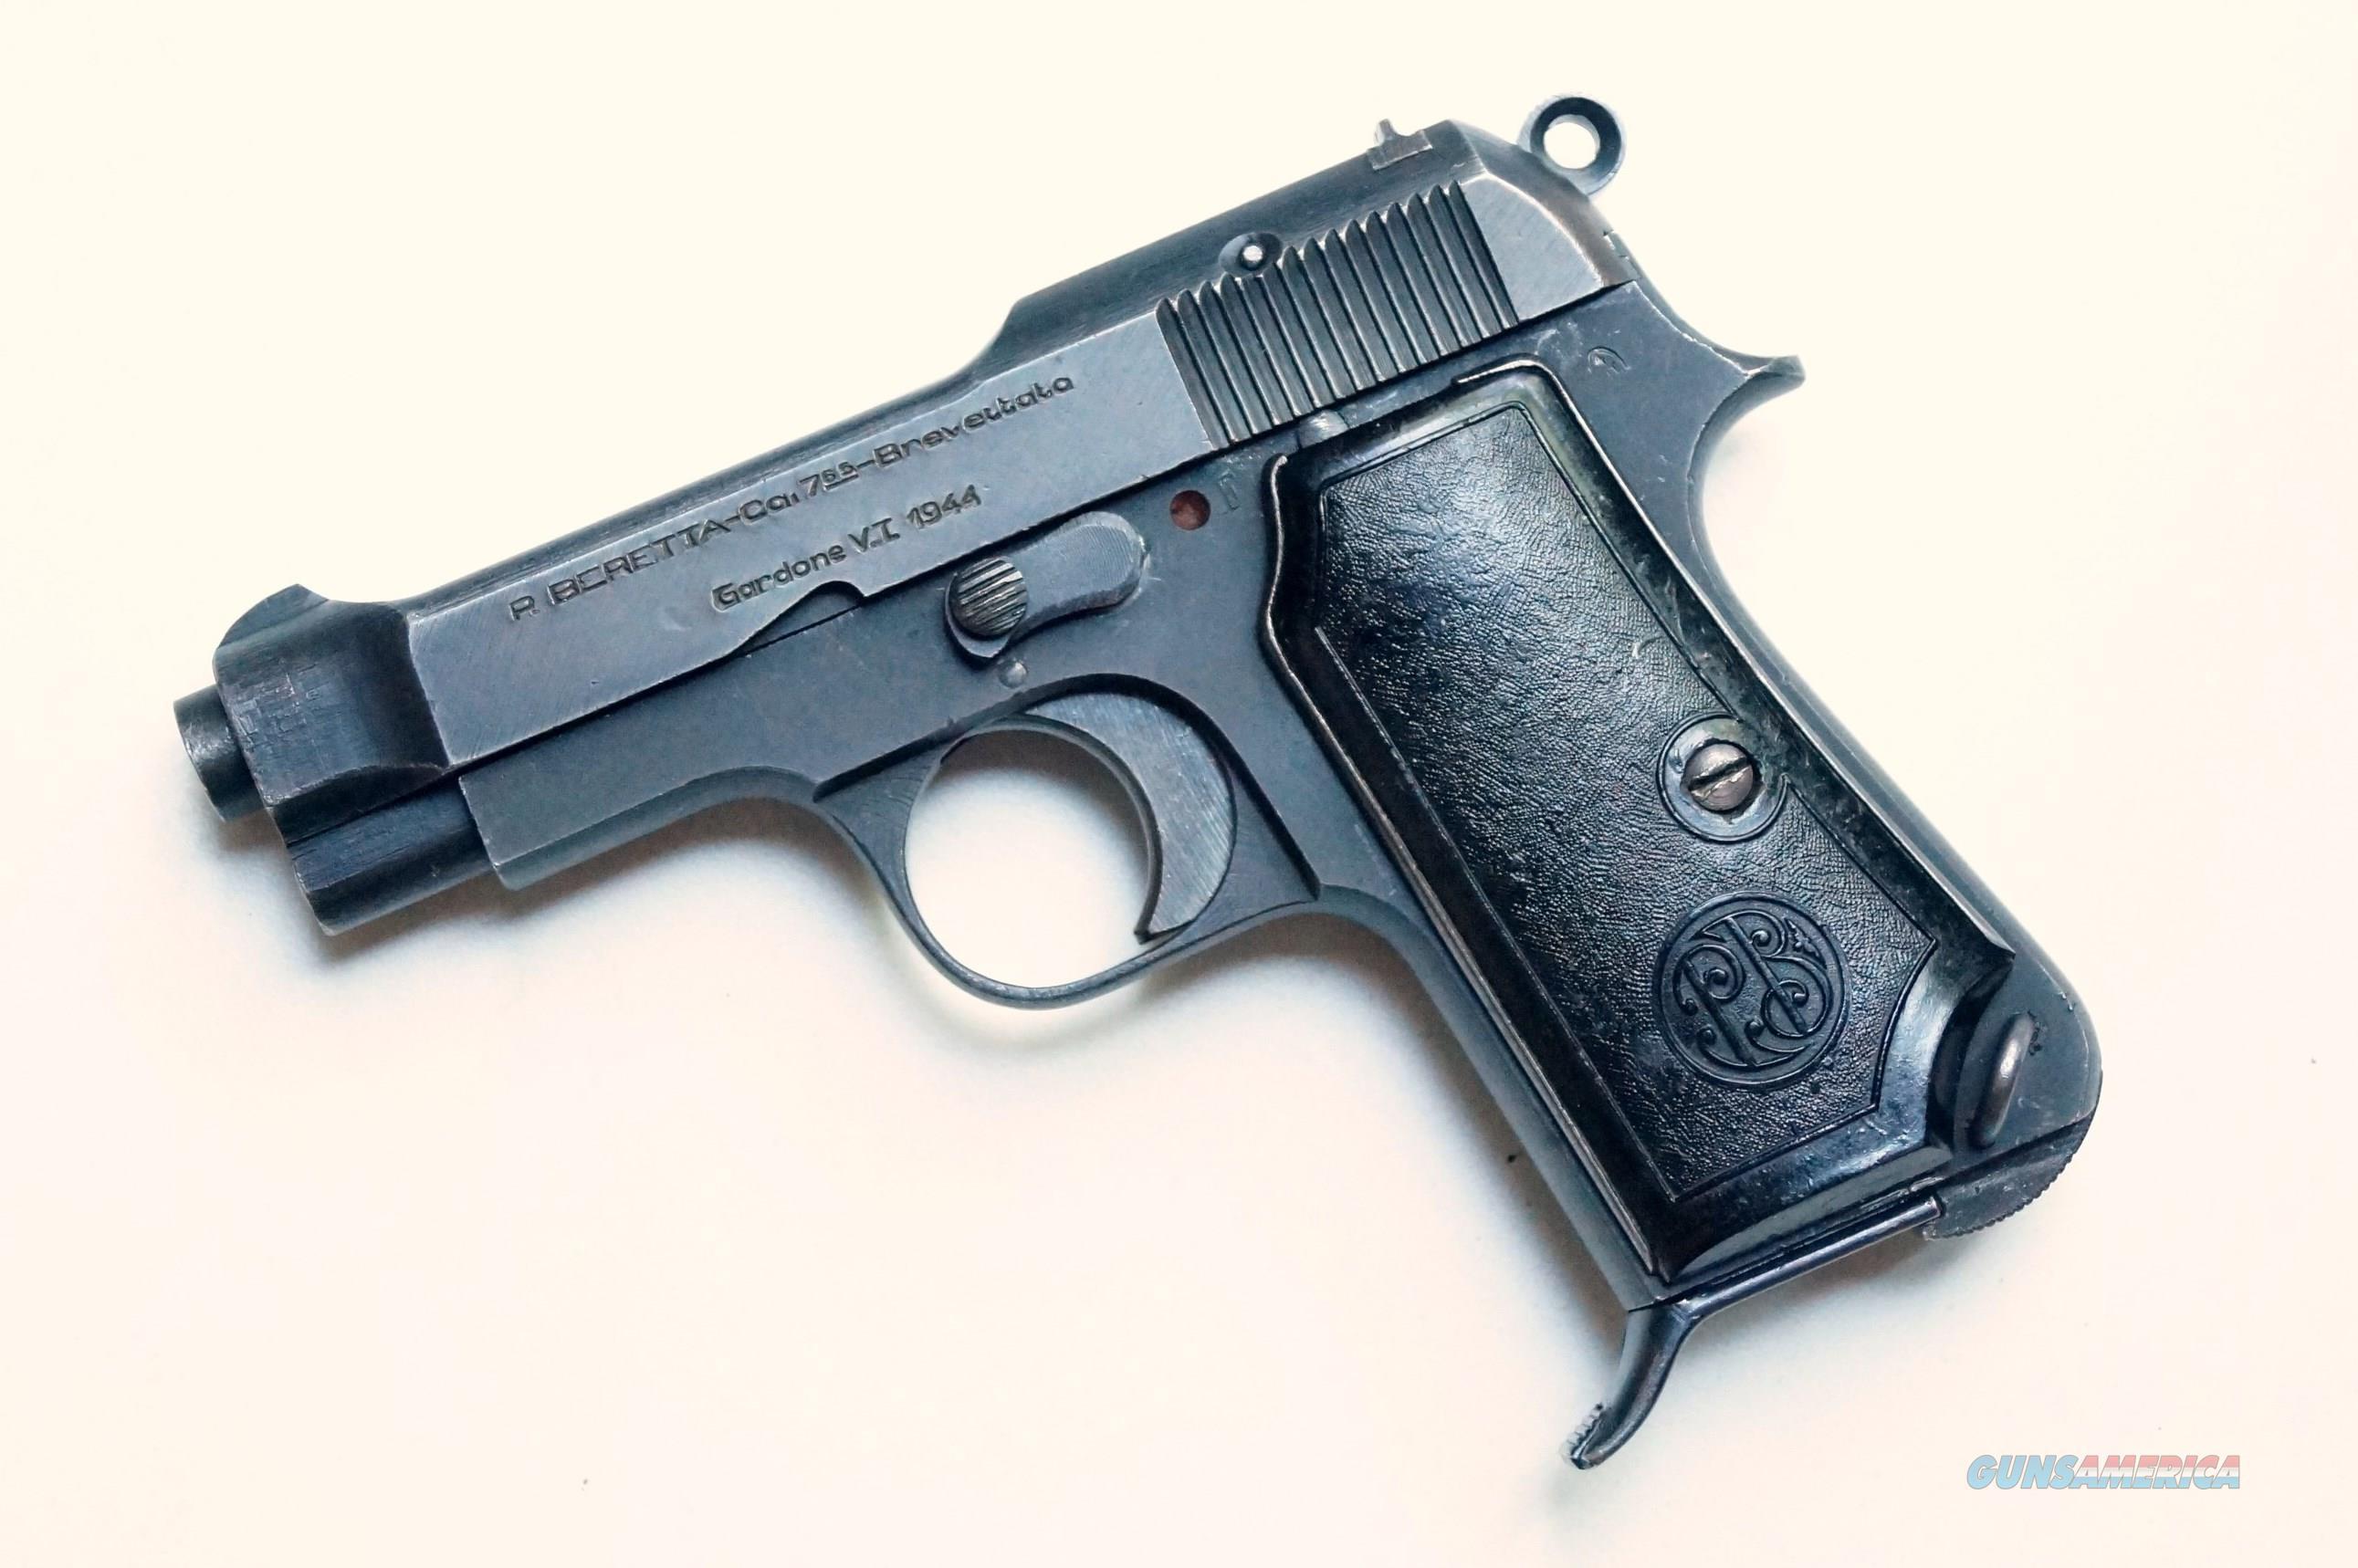 Beretta 1934 Markings Related Keywords & Suggestions